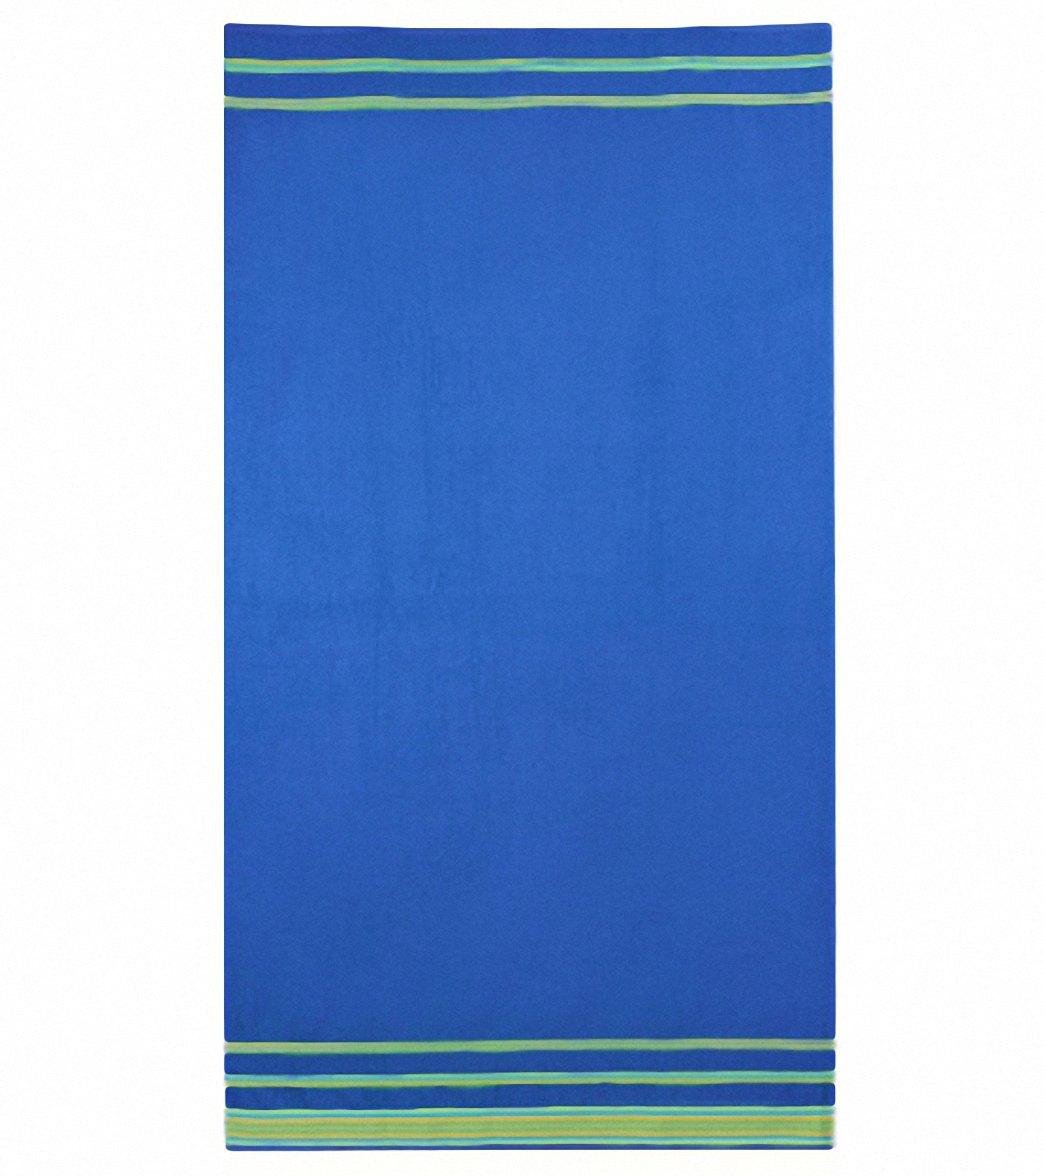 Kaufman S Solid Velour King Beach Towel 40